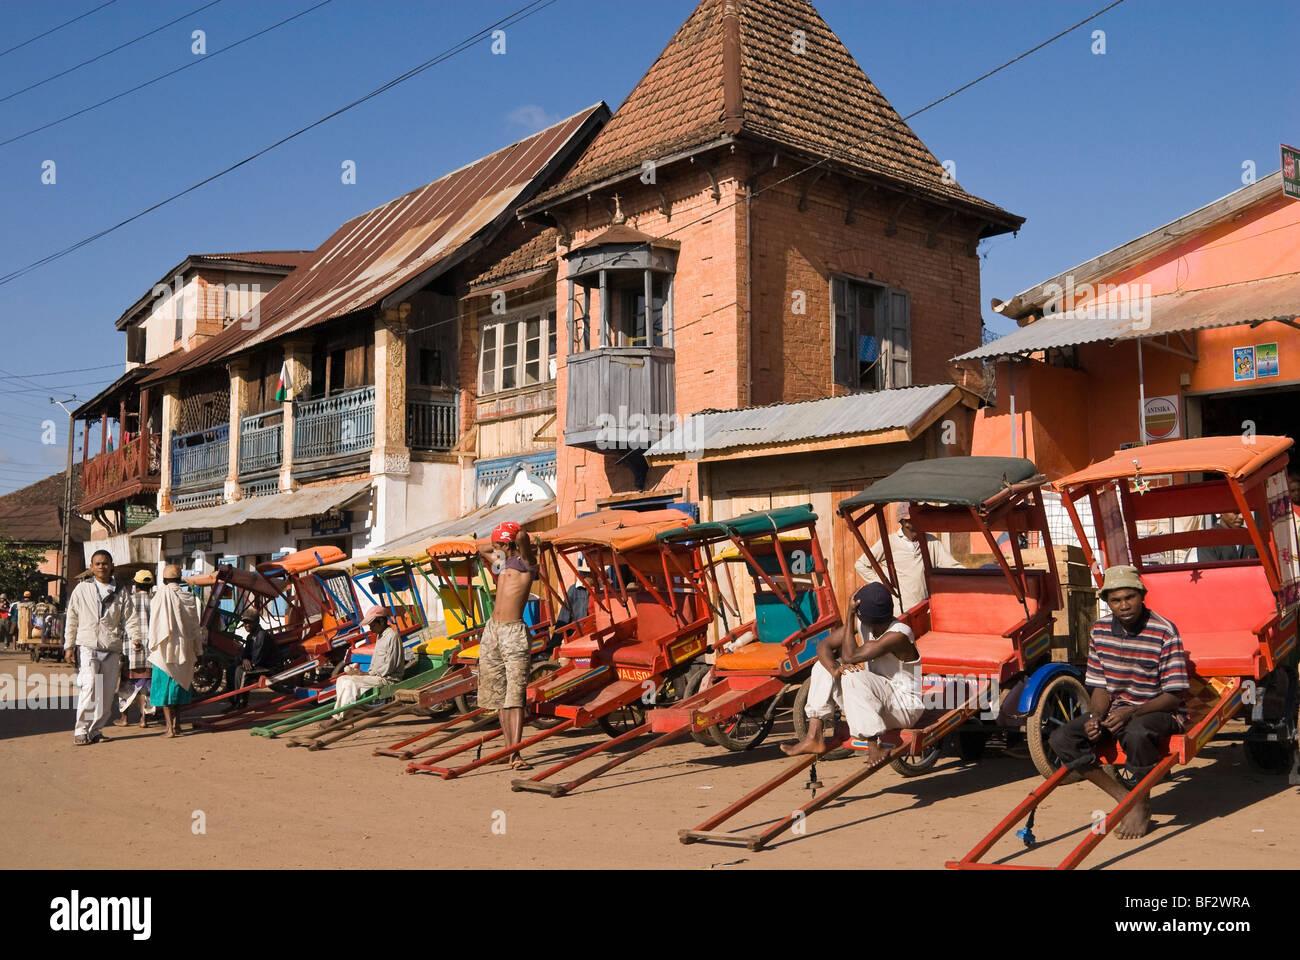 Rickshaw drivers waiting for customers, Ambositra, Madagascar - Stock Image